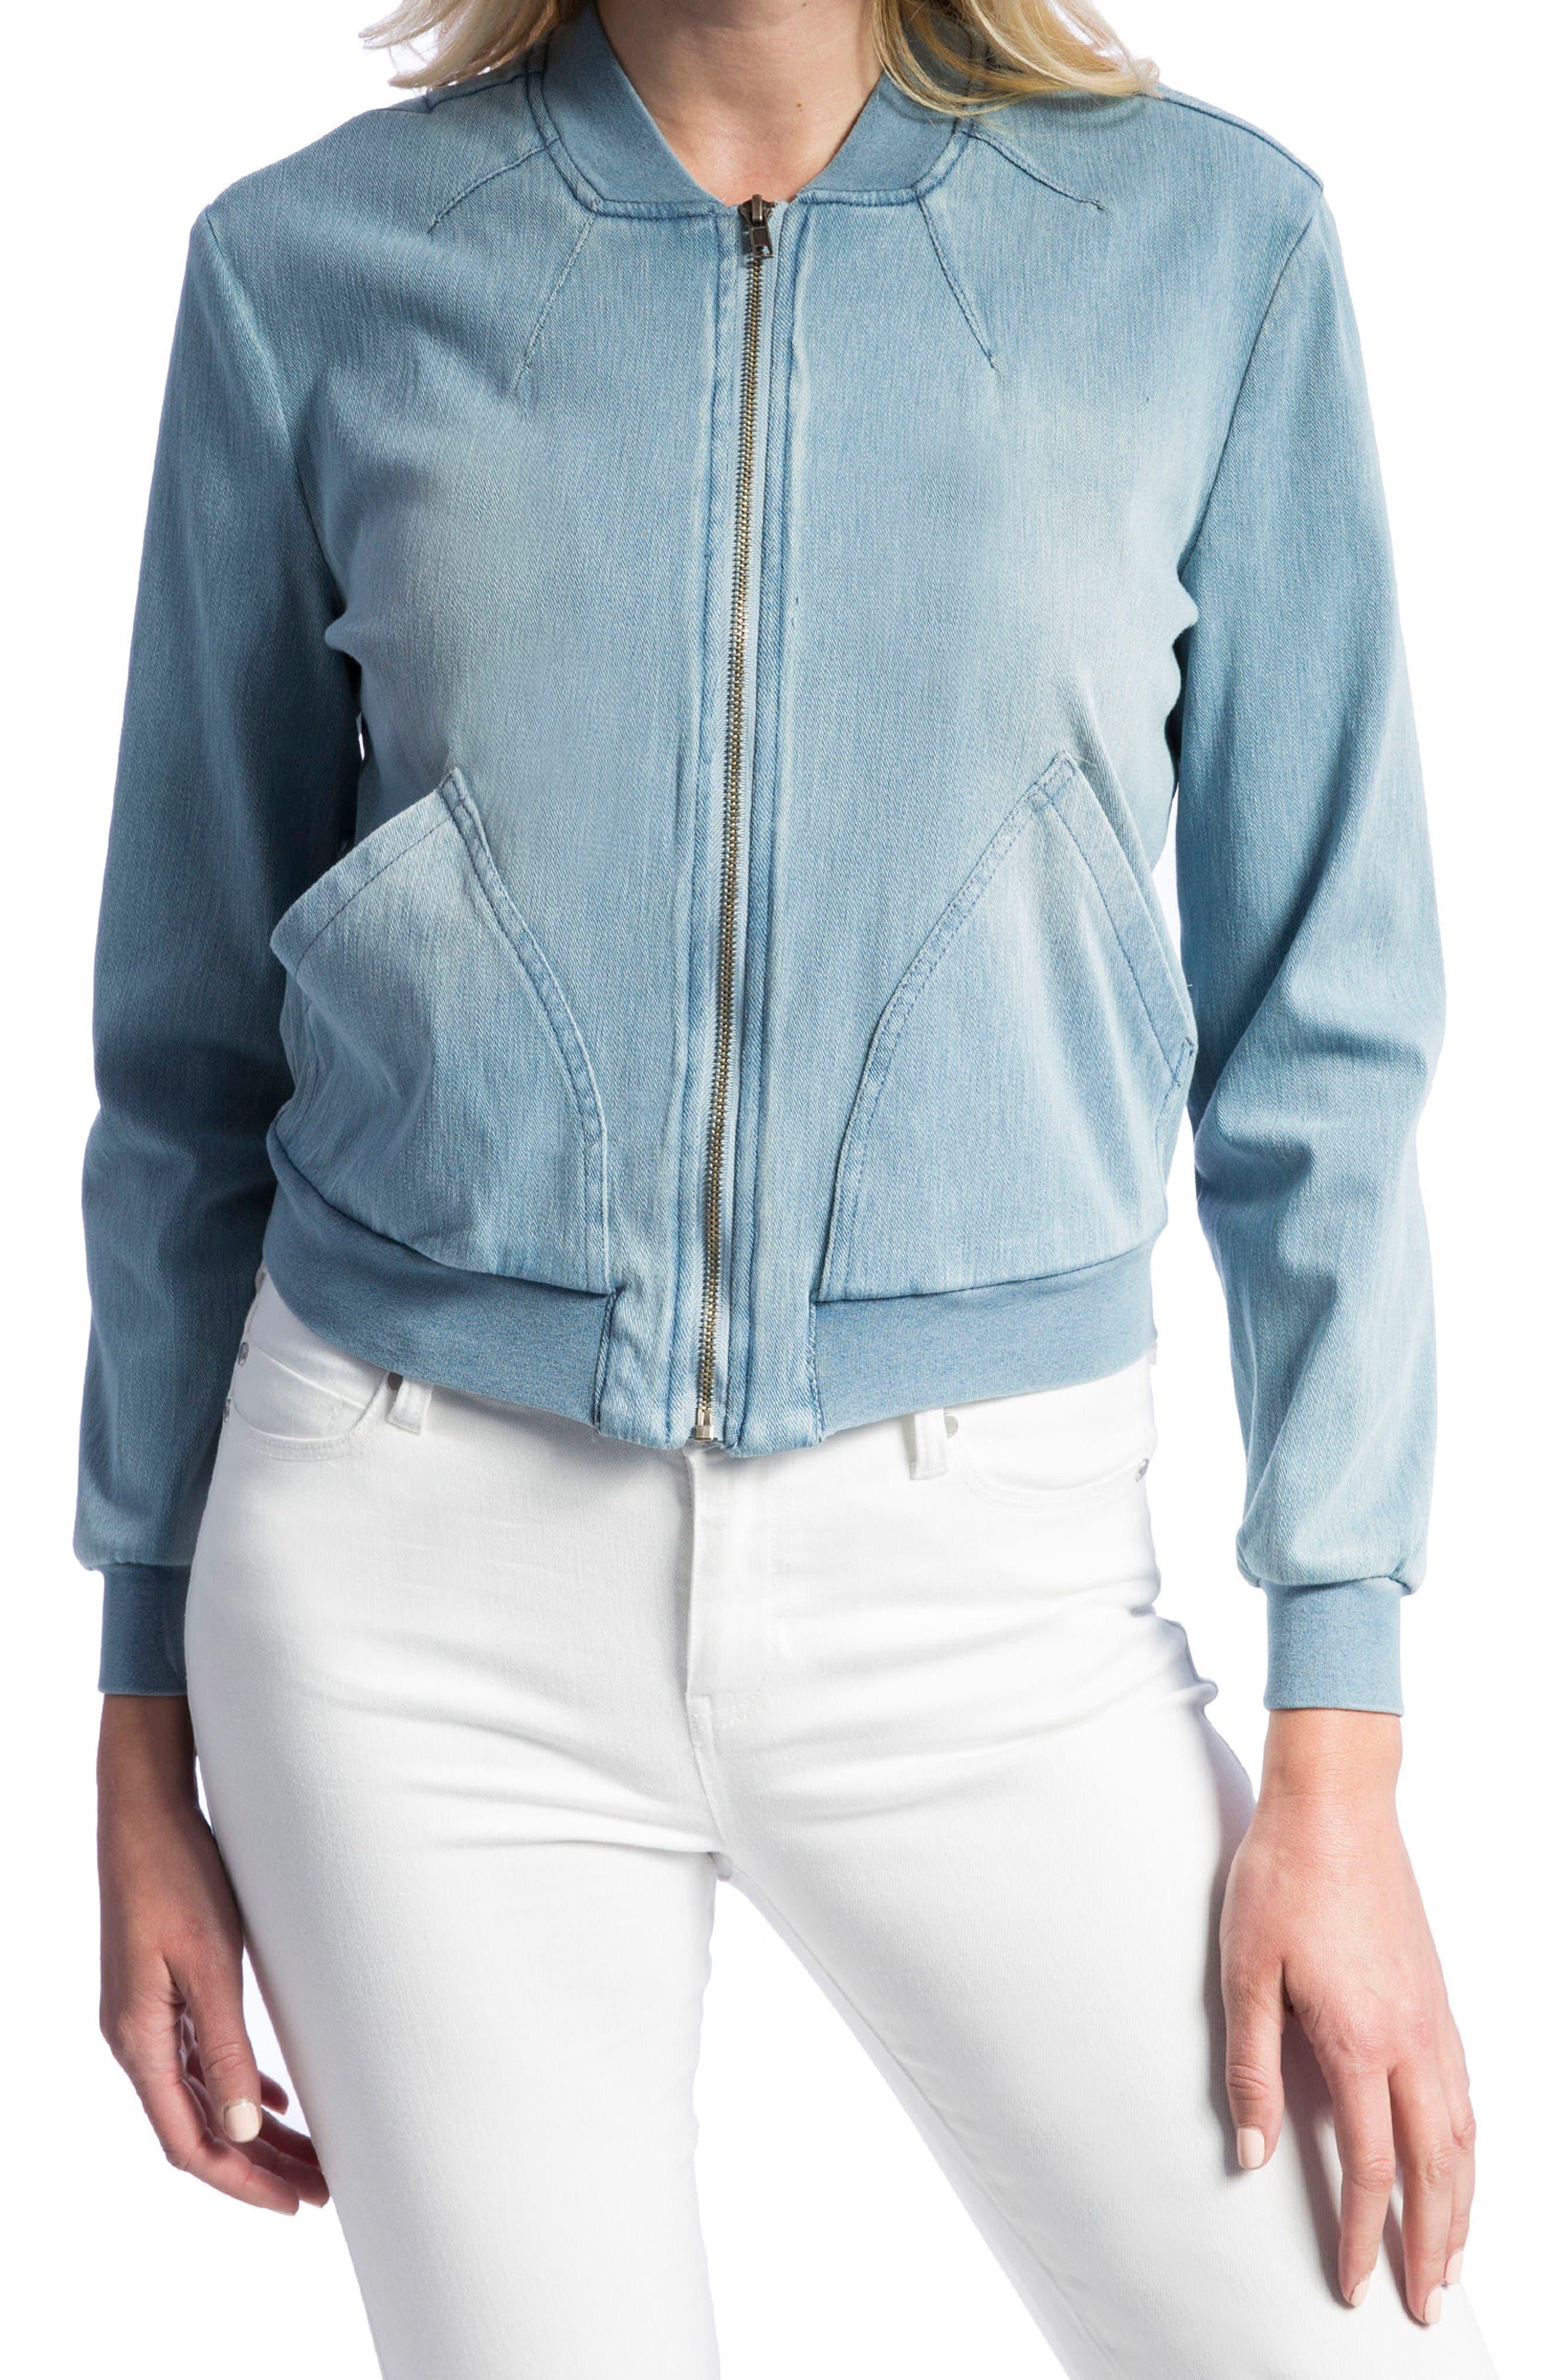 Liverpool Jeans Company Denim Knit Bomber Jacket